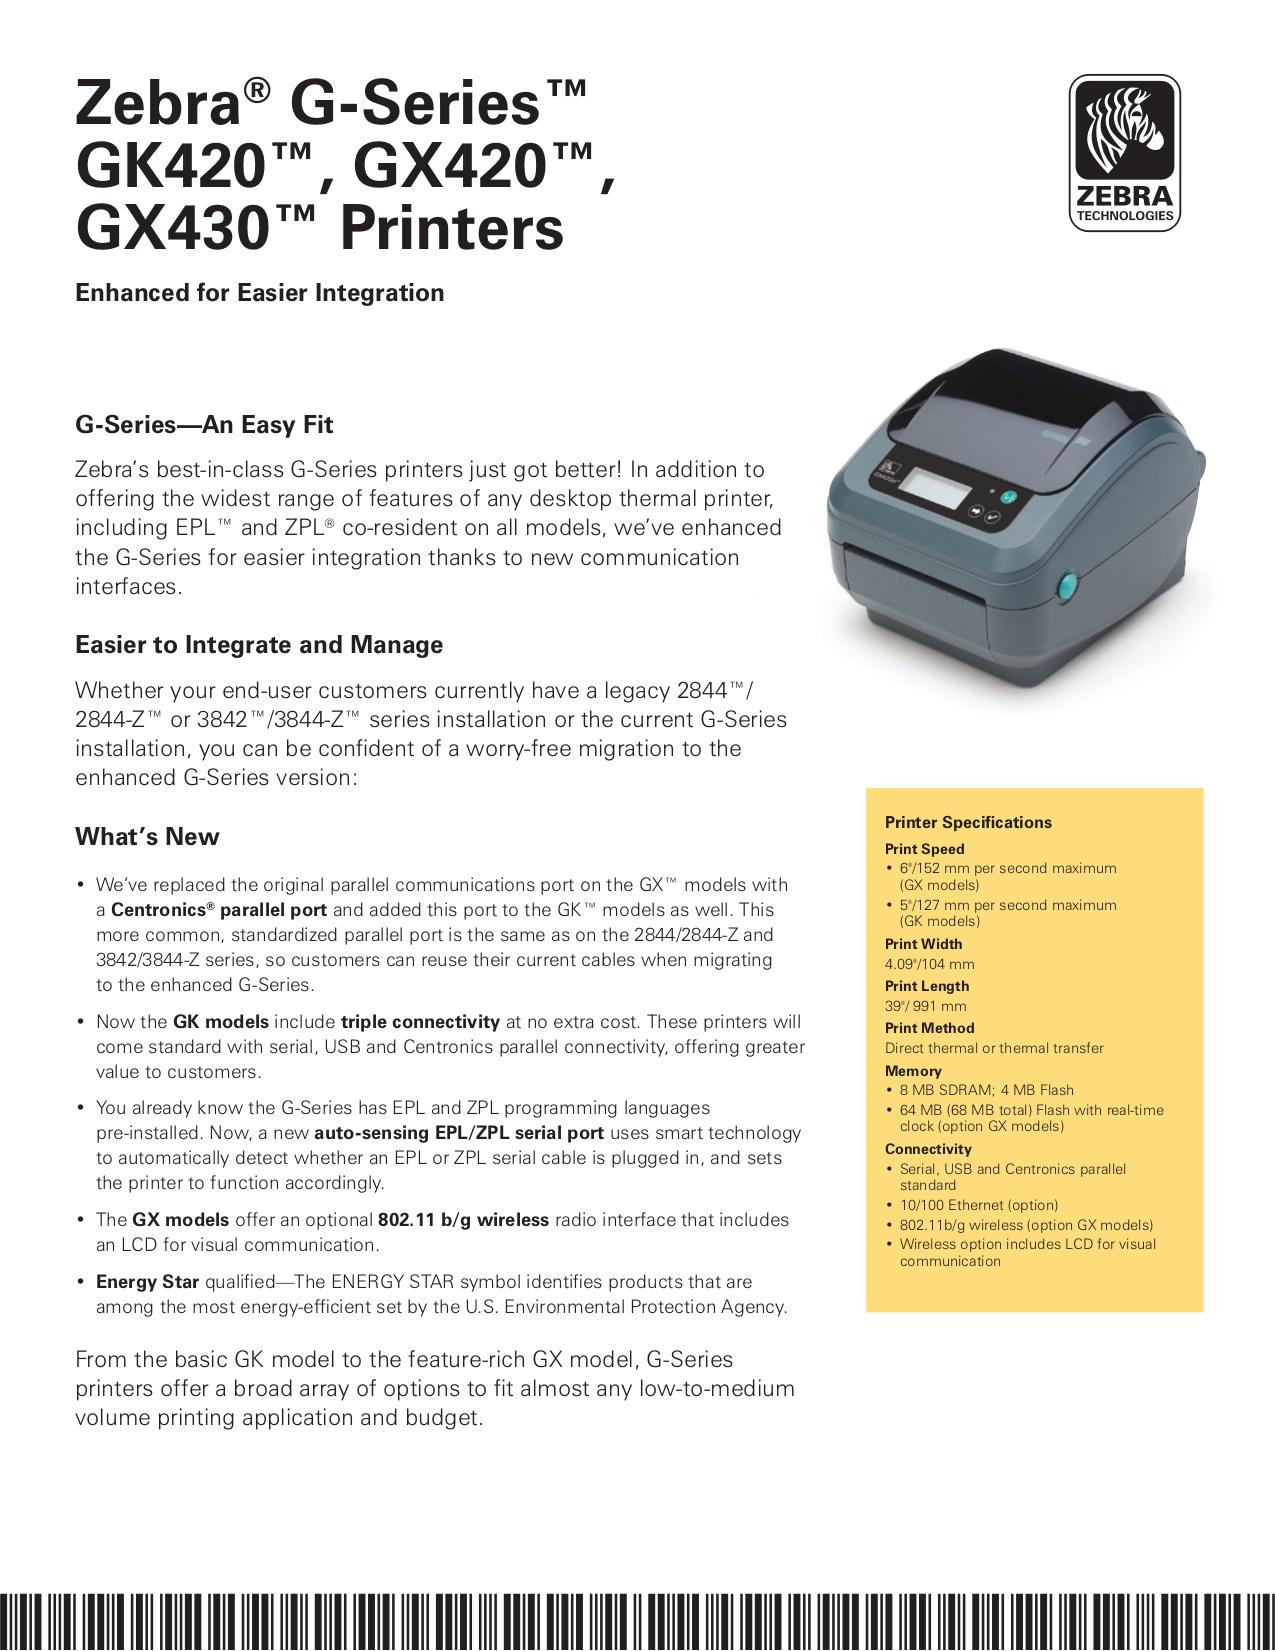 Gk420t Manual Pdf Download